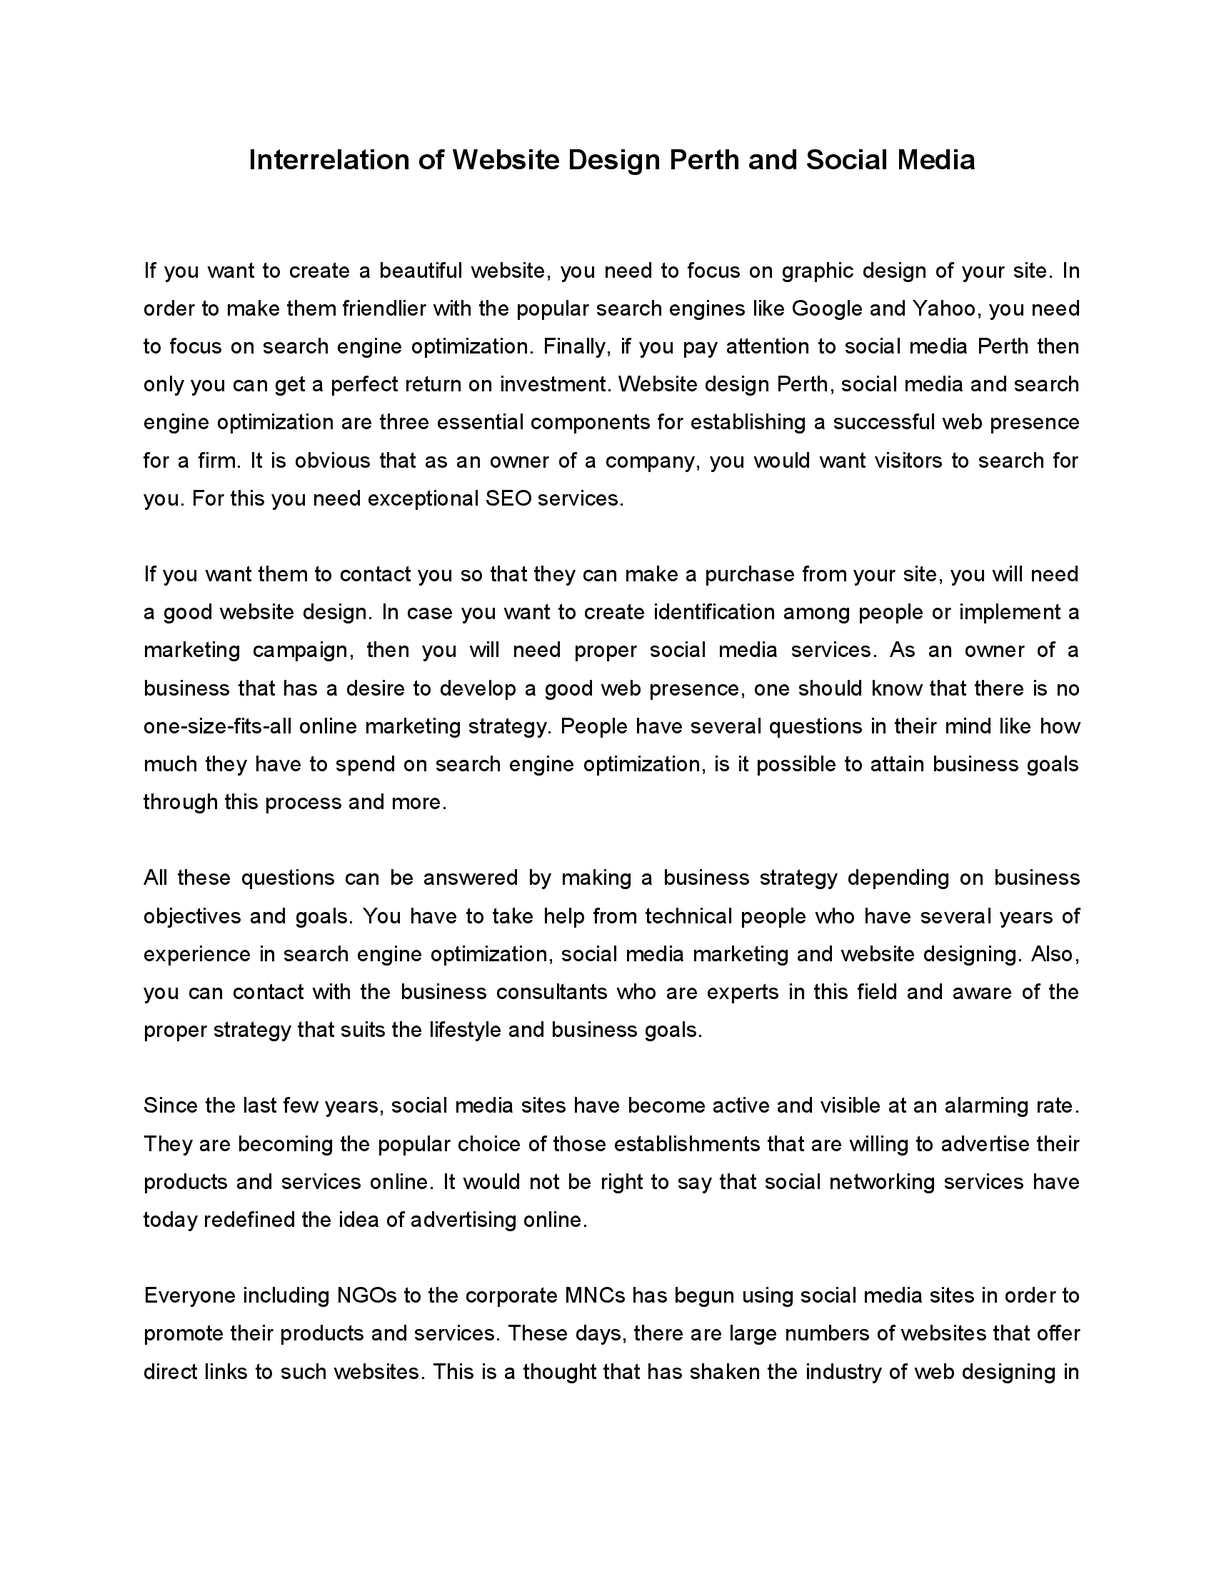 Calaméo - Interrelation of Website Design Perth and Social Media